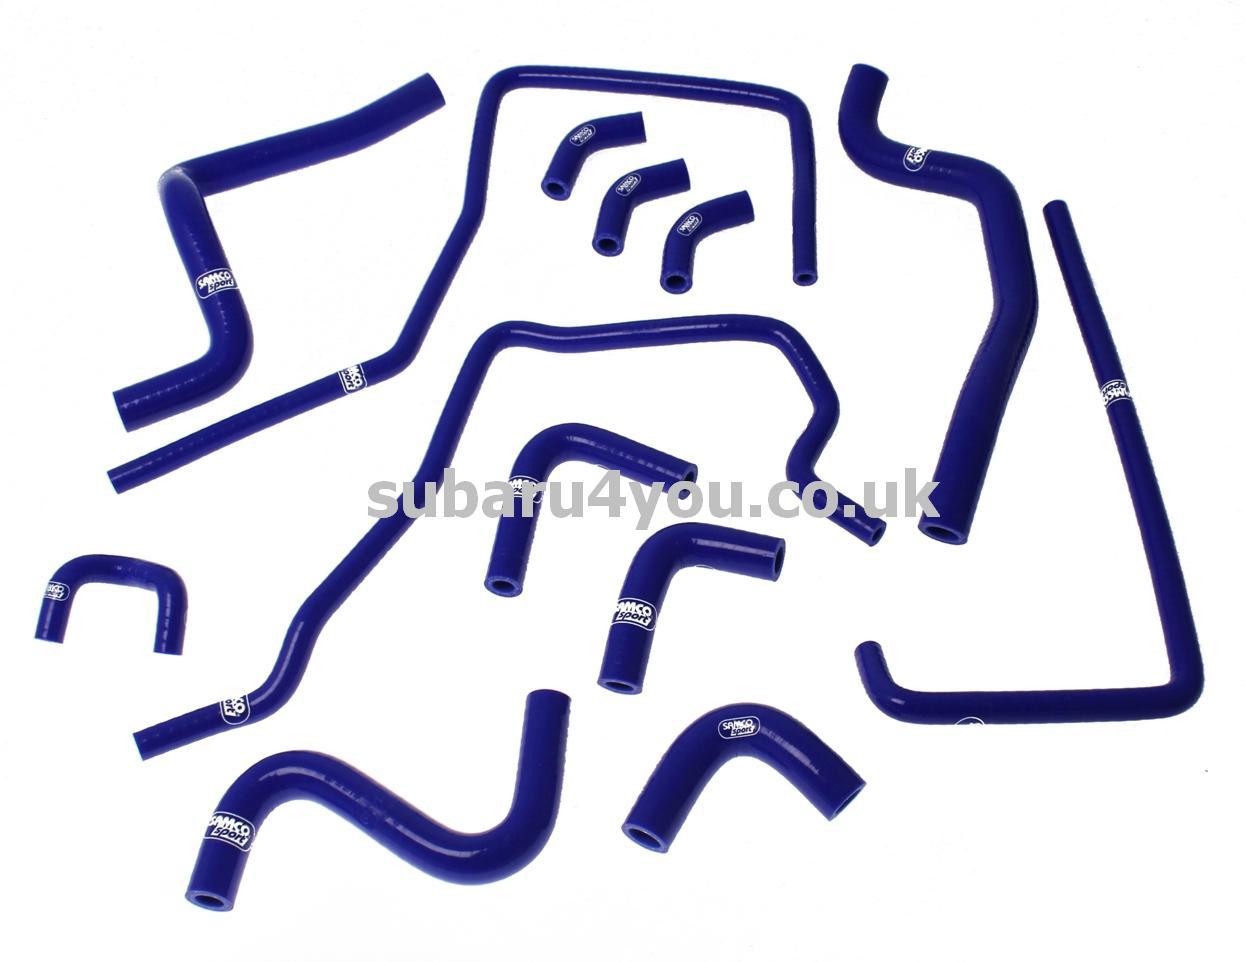 Subaru Parts Uk Genuine Oem 97 Impreza Engine Diagram Silicone Hoses